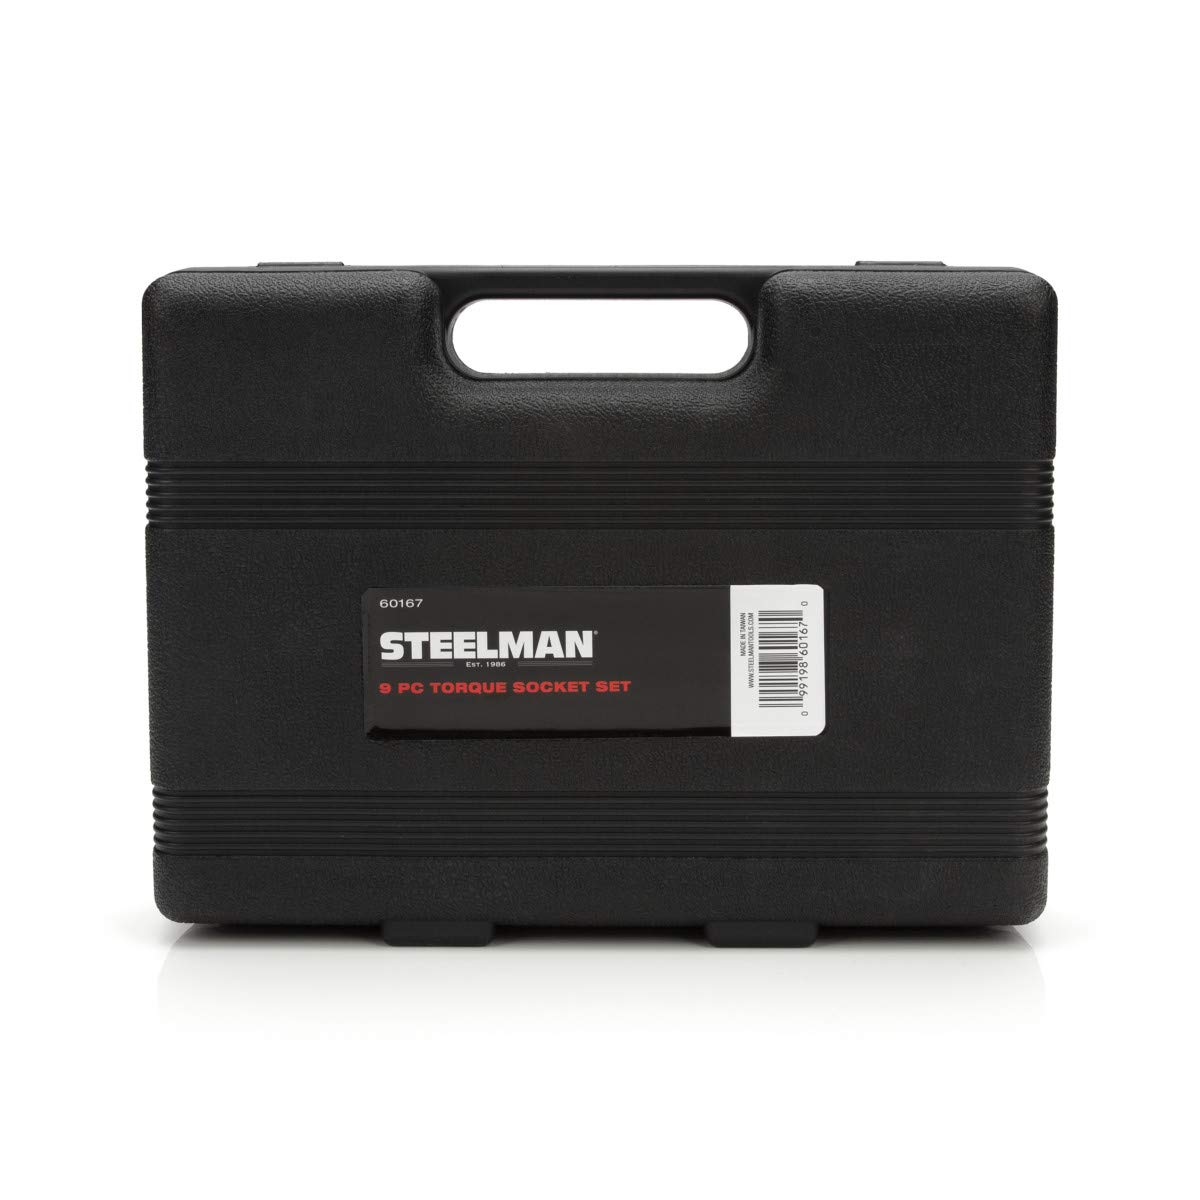 STEELMAN 60167 9-Piece 1//2-Inch Drive Torque Stick Set